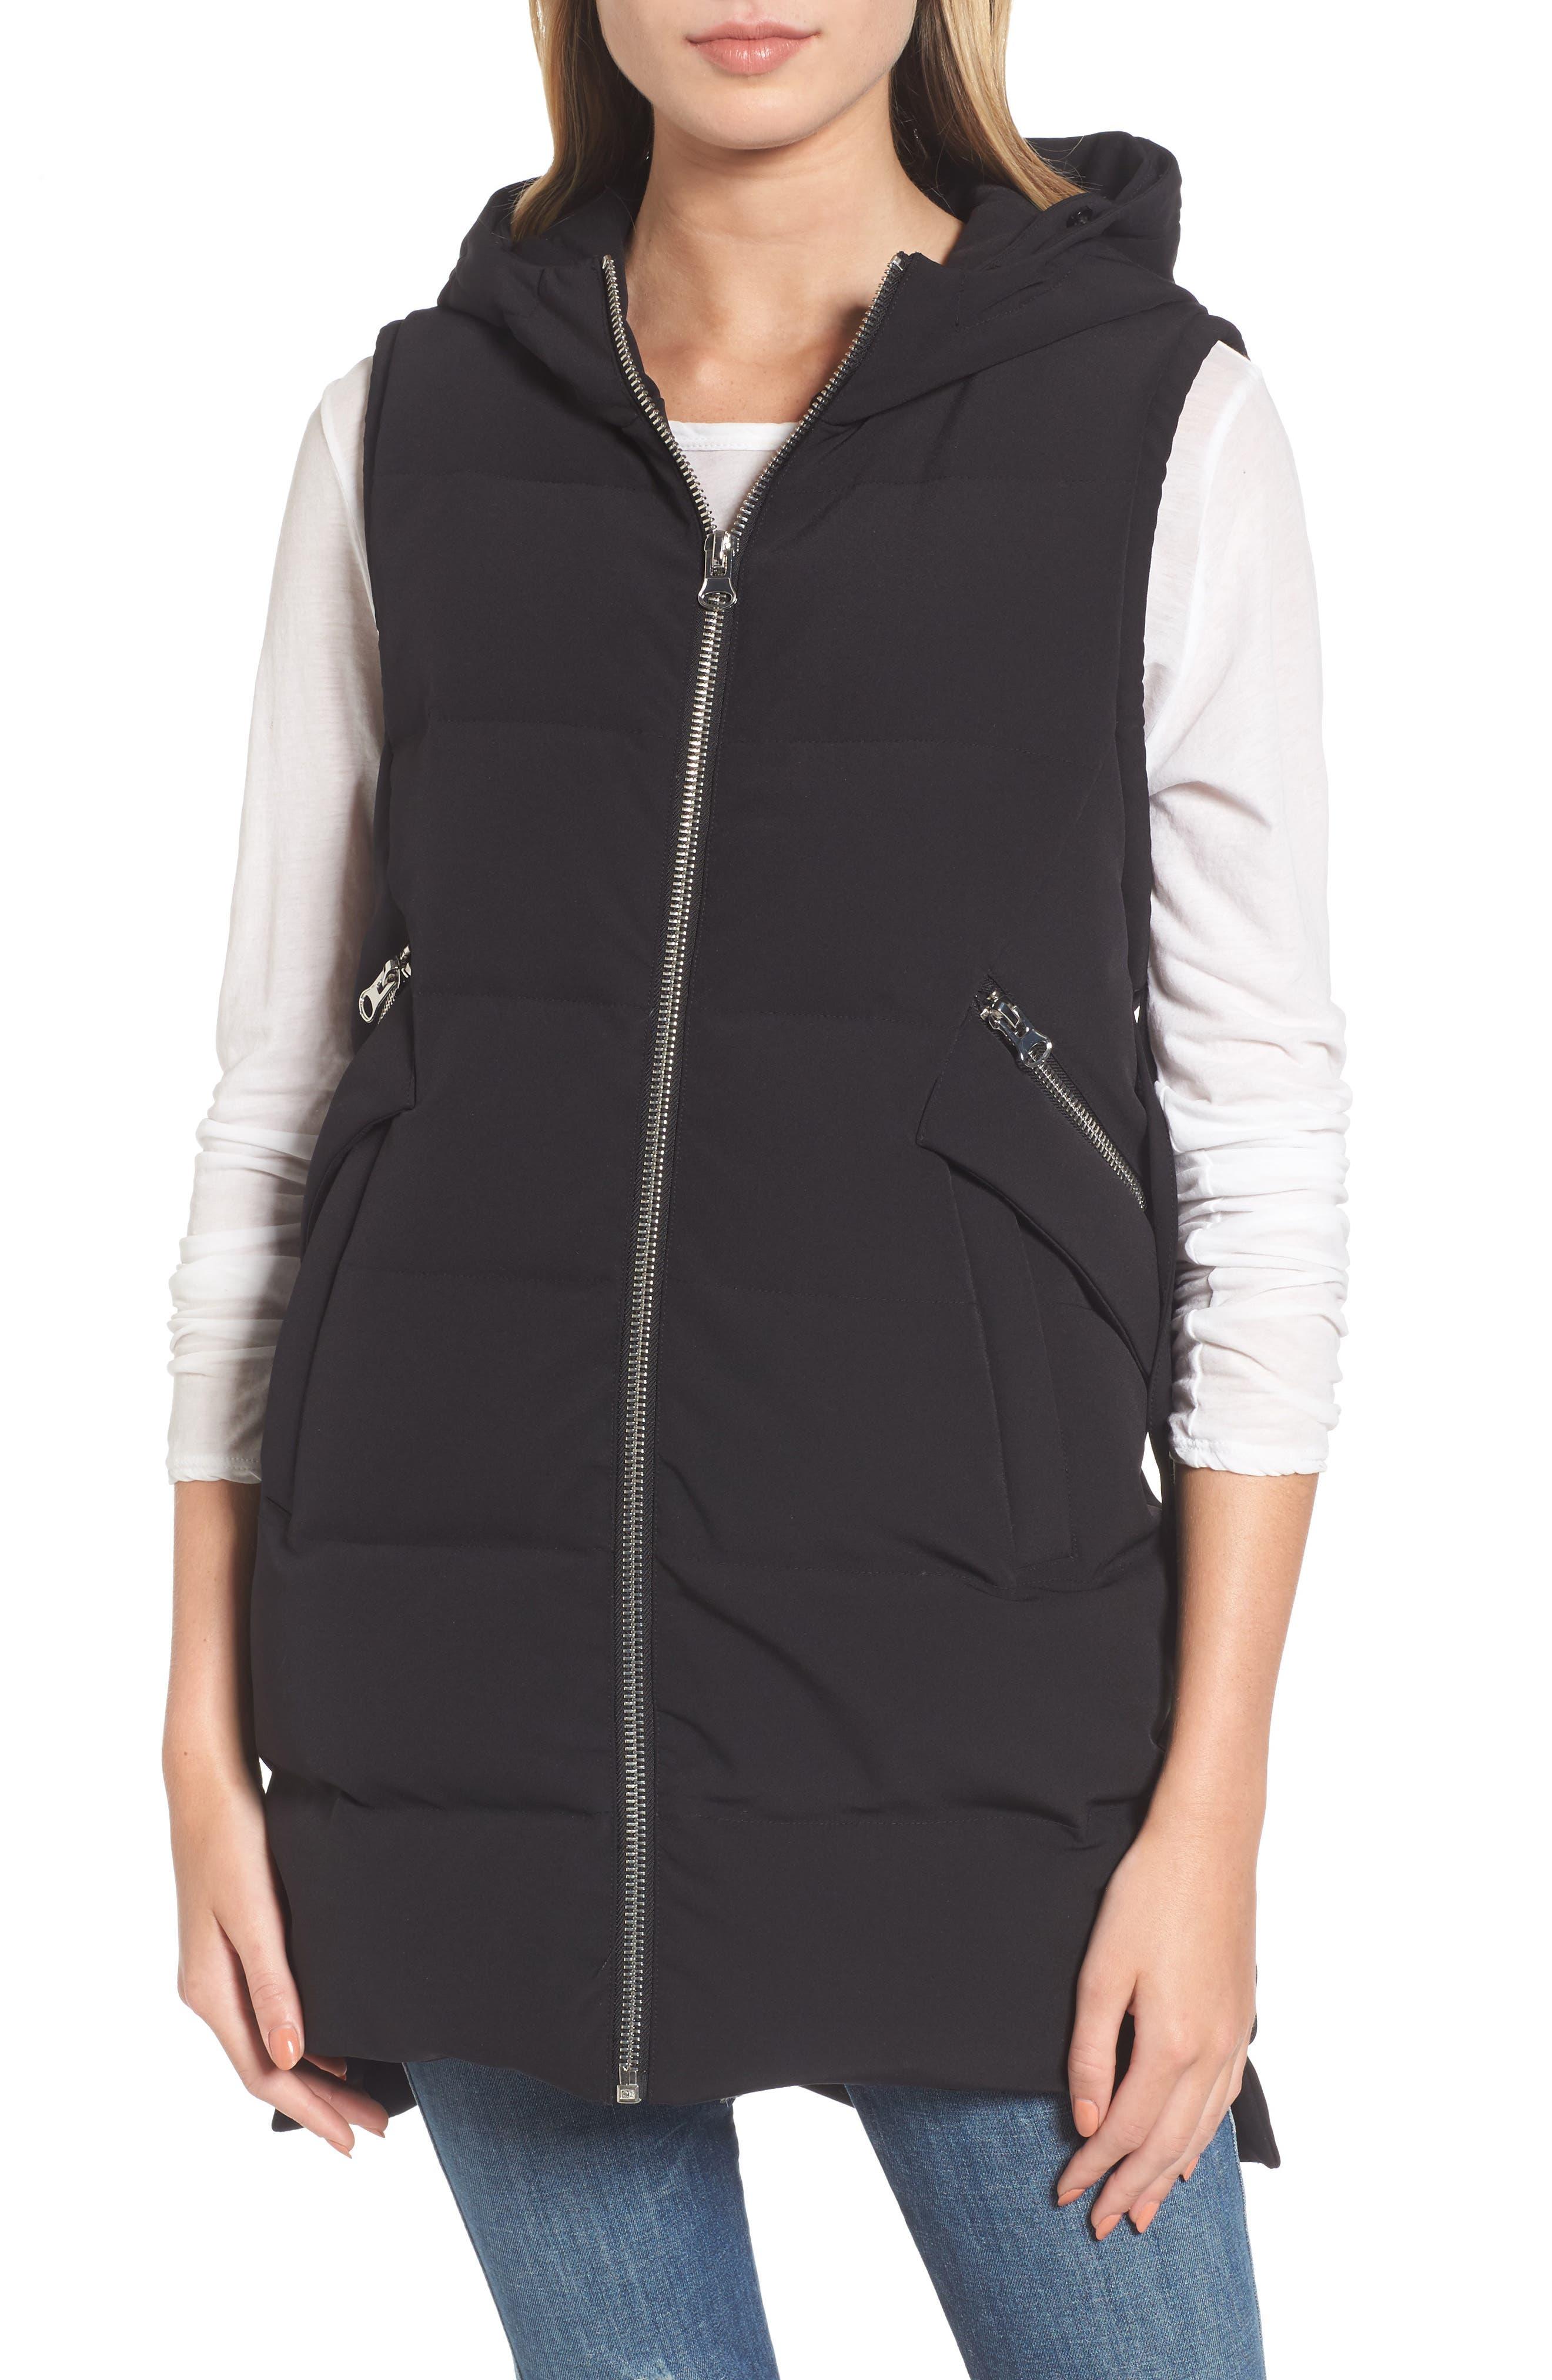 Down Vest with Genuine Fox Fur,                             Alternate thumbnail 4, color,                             001